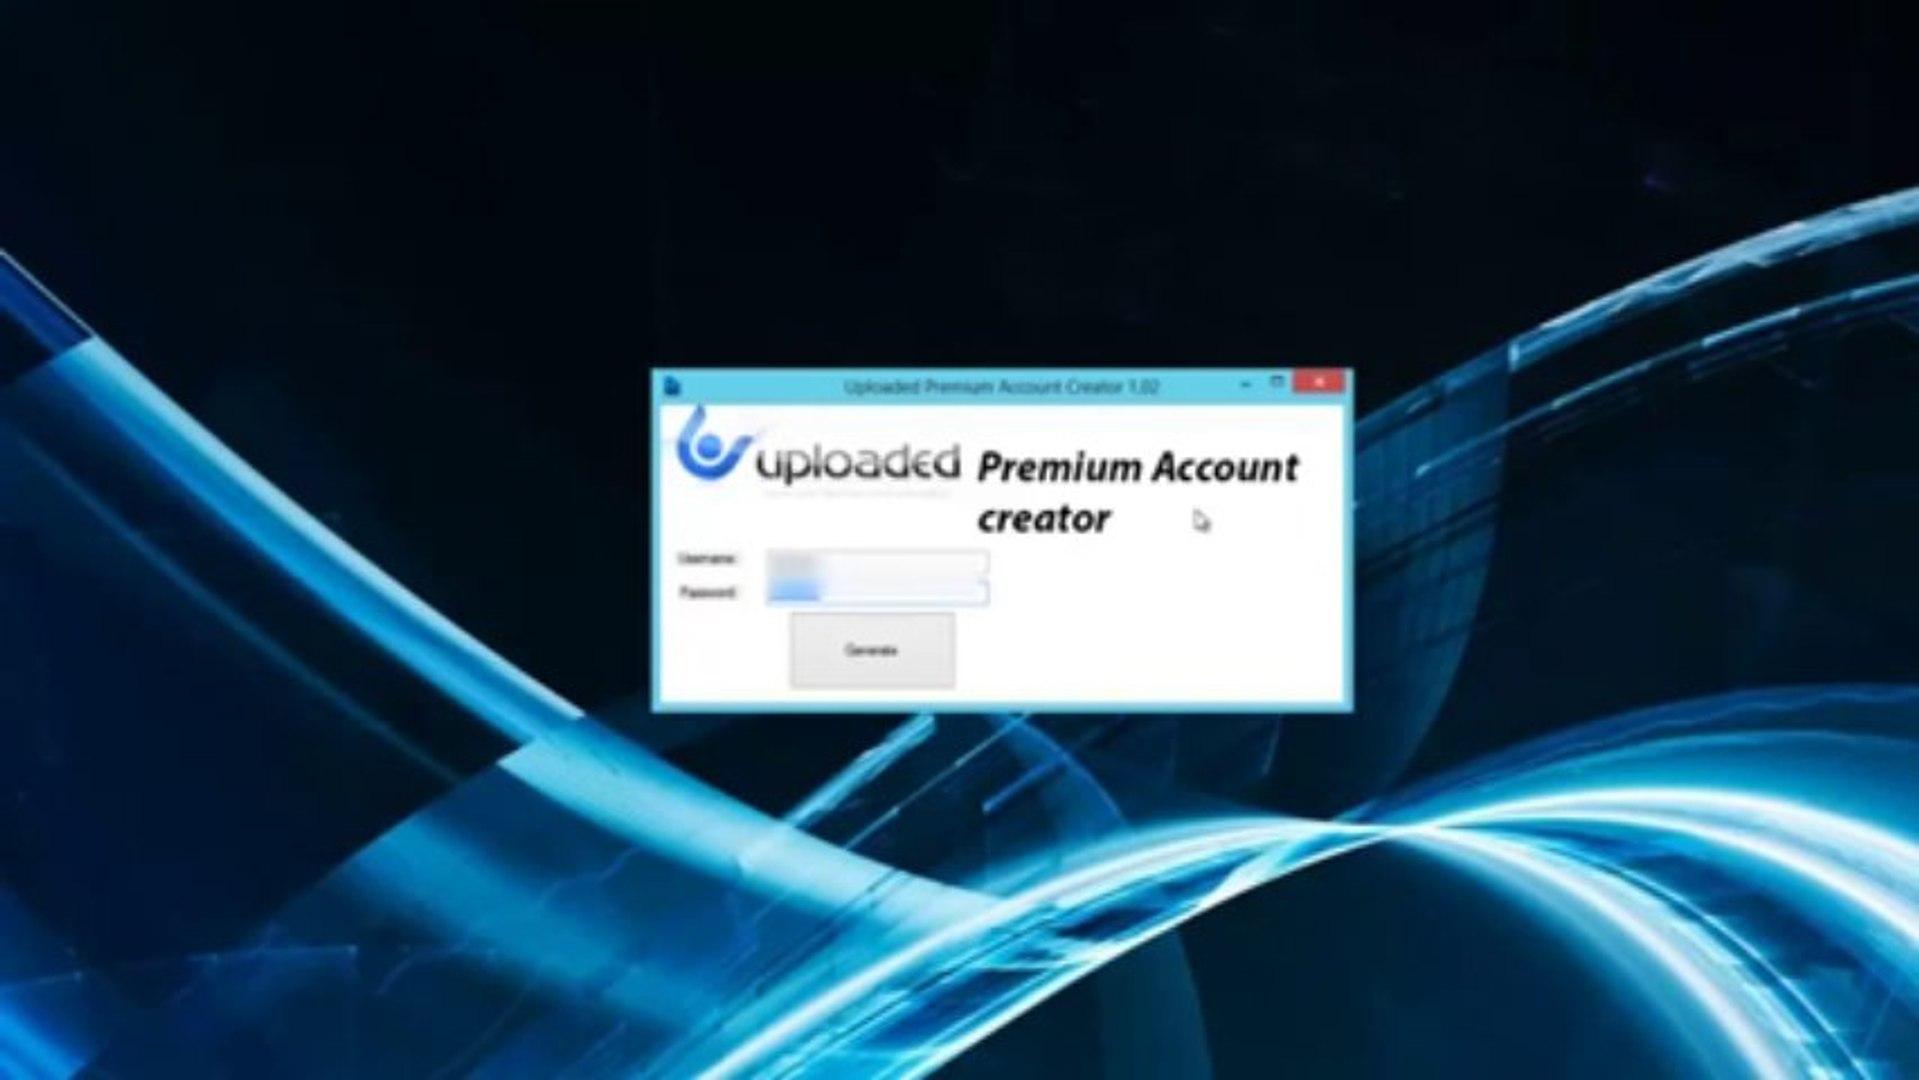 Uploaded Premium Account Generator [Account creator Download]